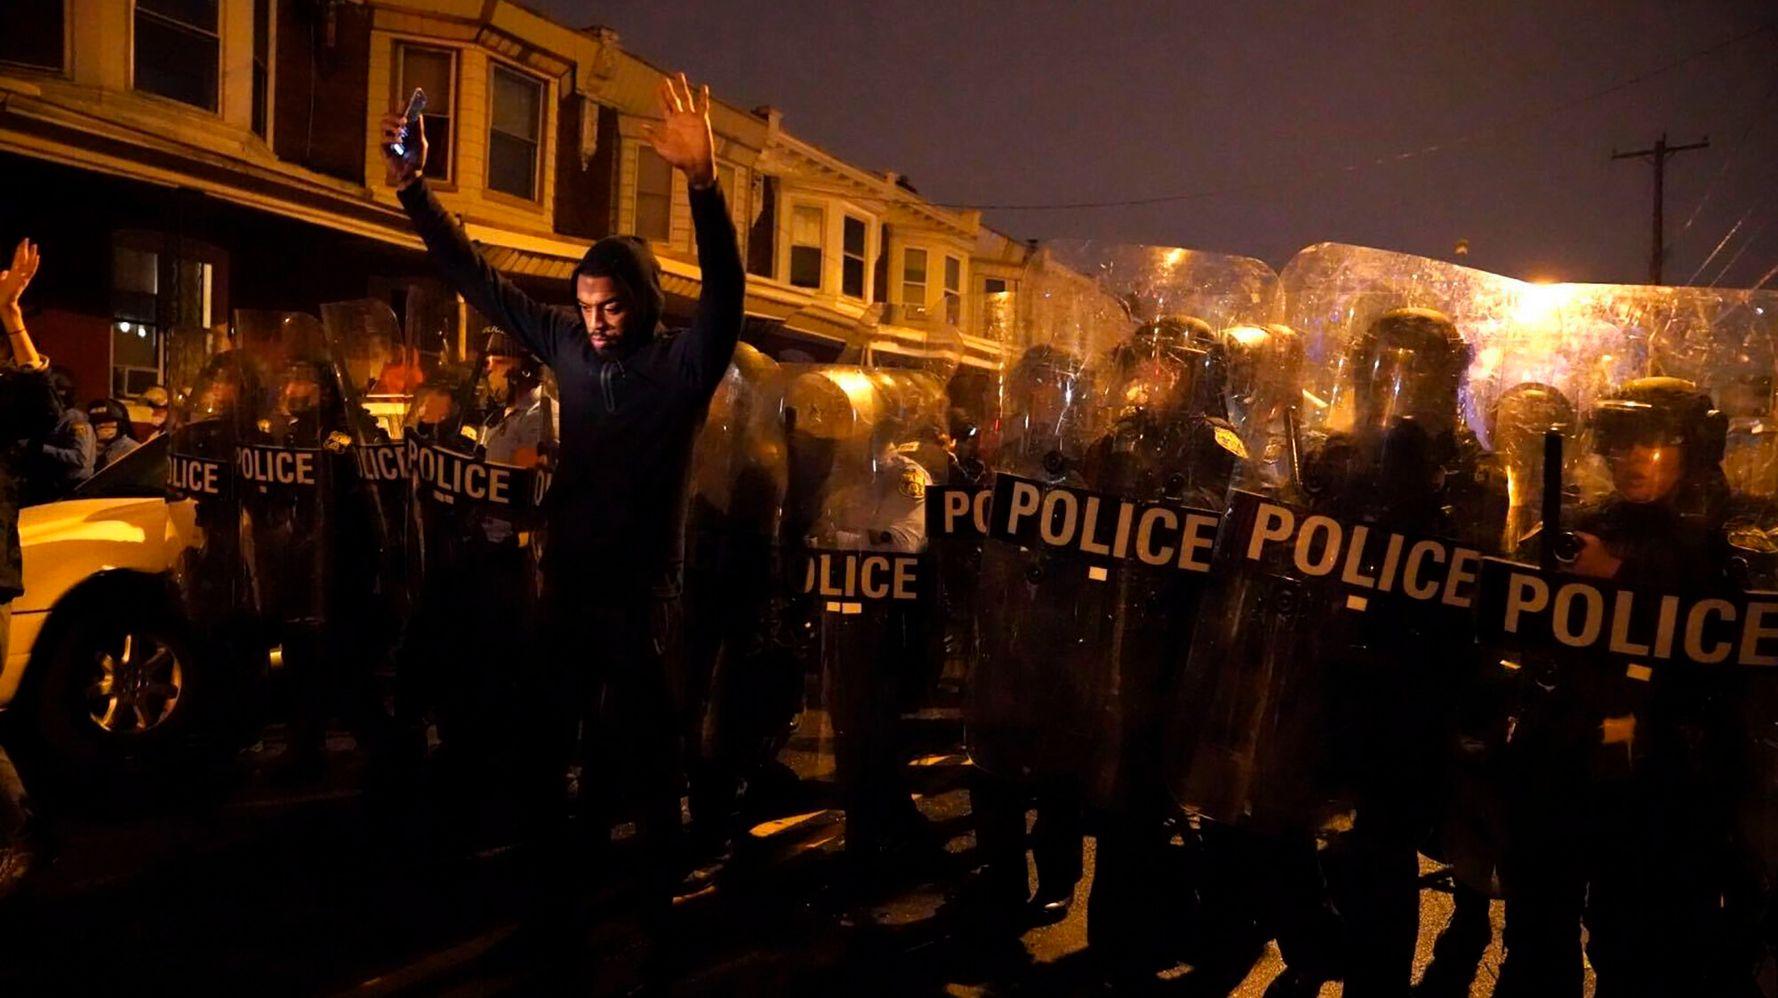 Philadelphia Police Fatally Shoot Black Man, Sparking Overnight Protests